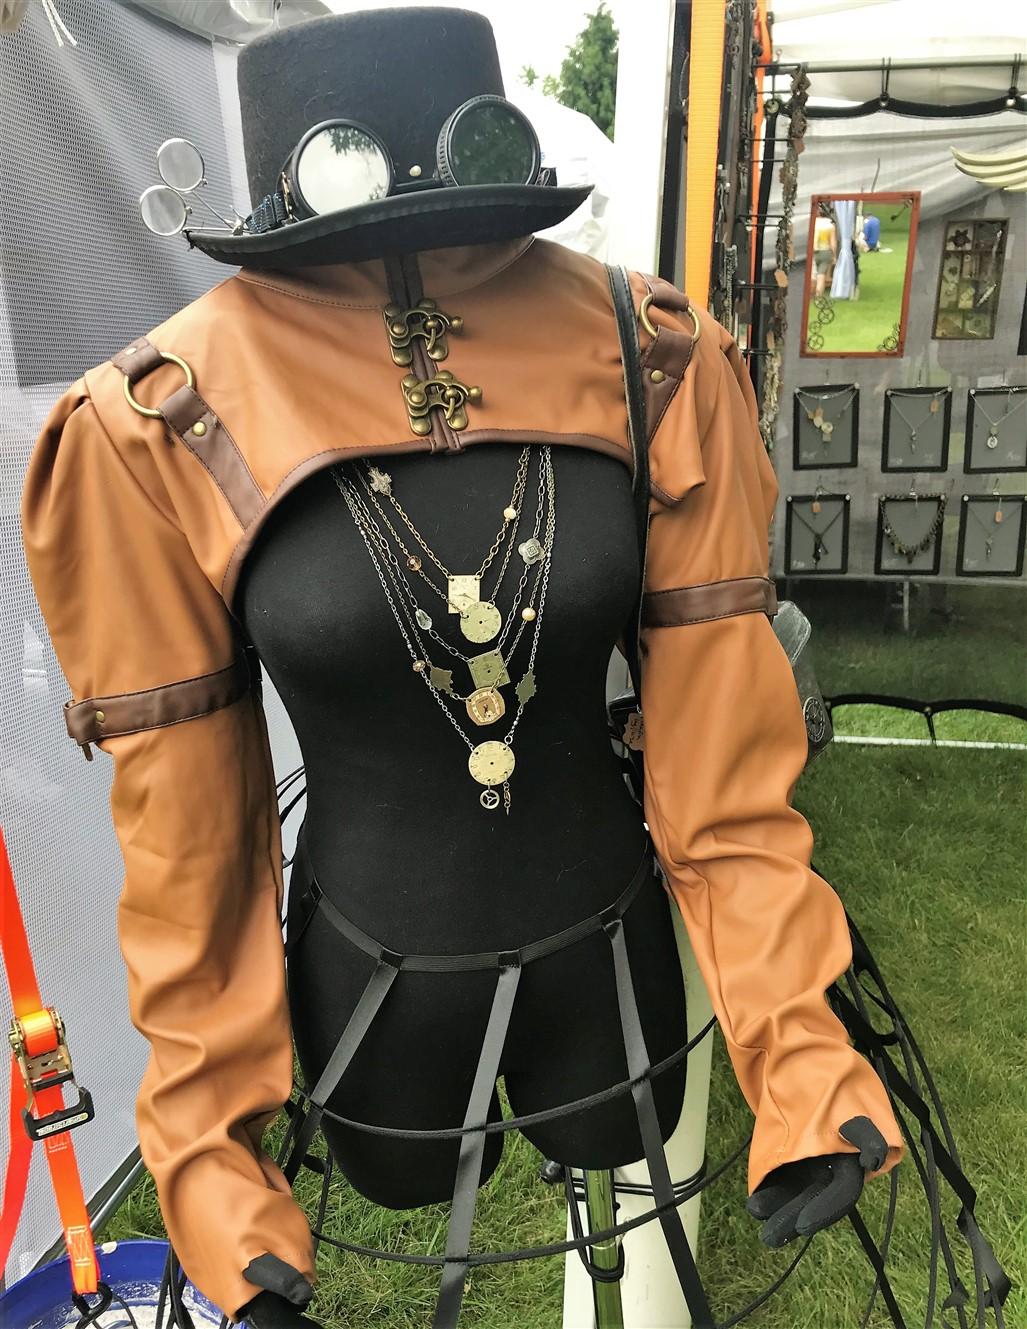 2018 06 16 15 Worthington OH Arts Festival.jpg